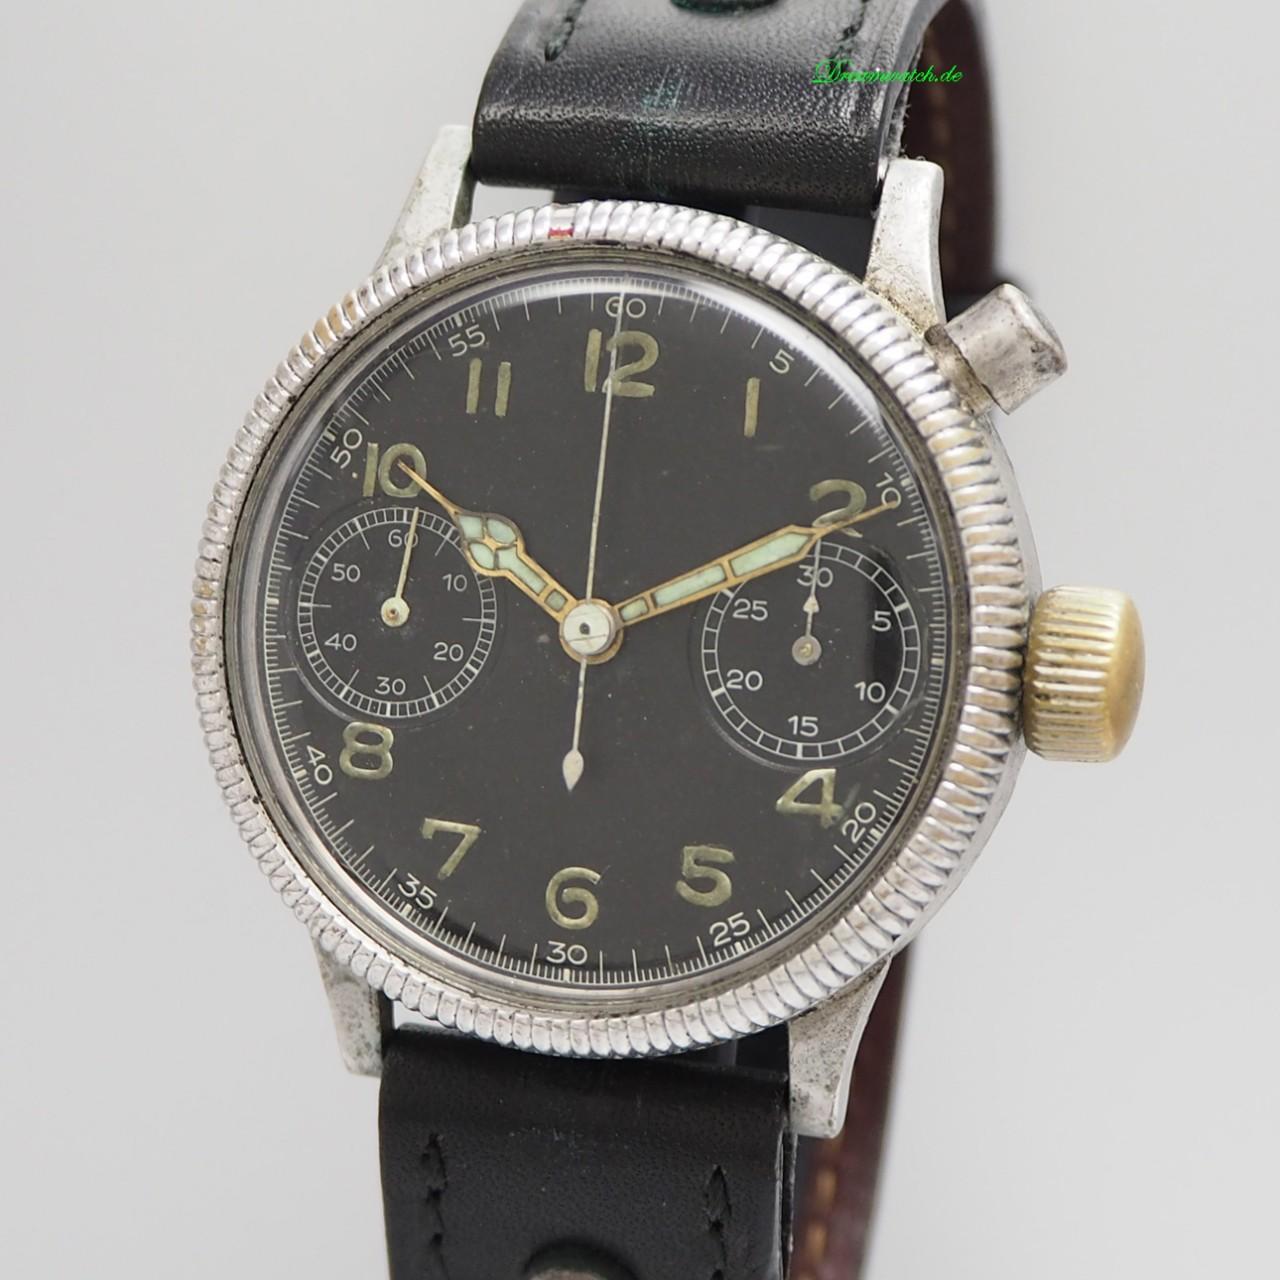 Hanhart Vintage Monopusher/ Eindrücker Chronograph WW2 Cal.40/50 NON BRANDING